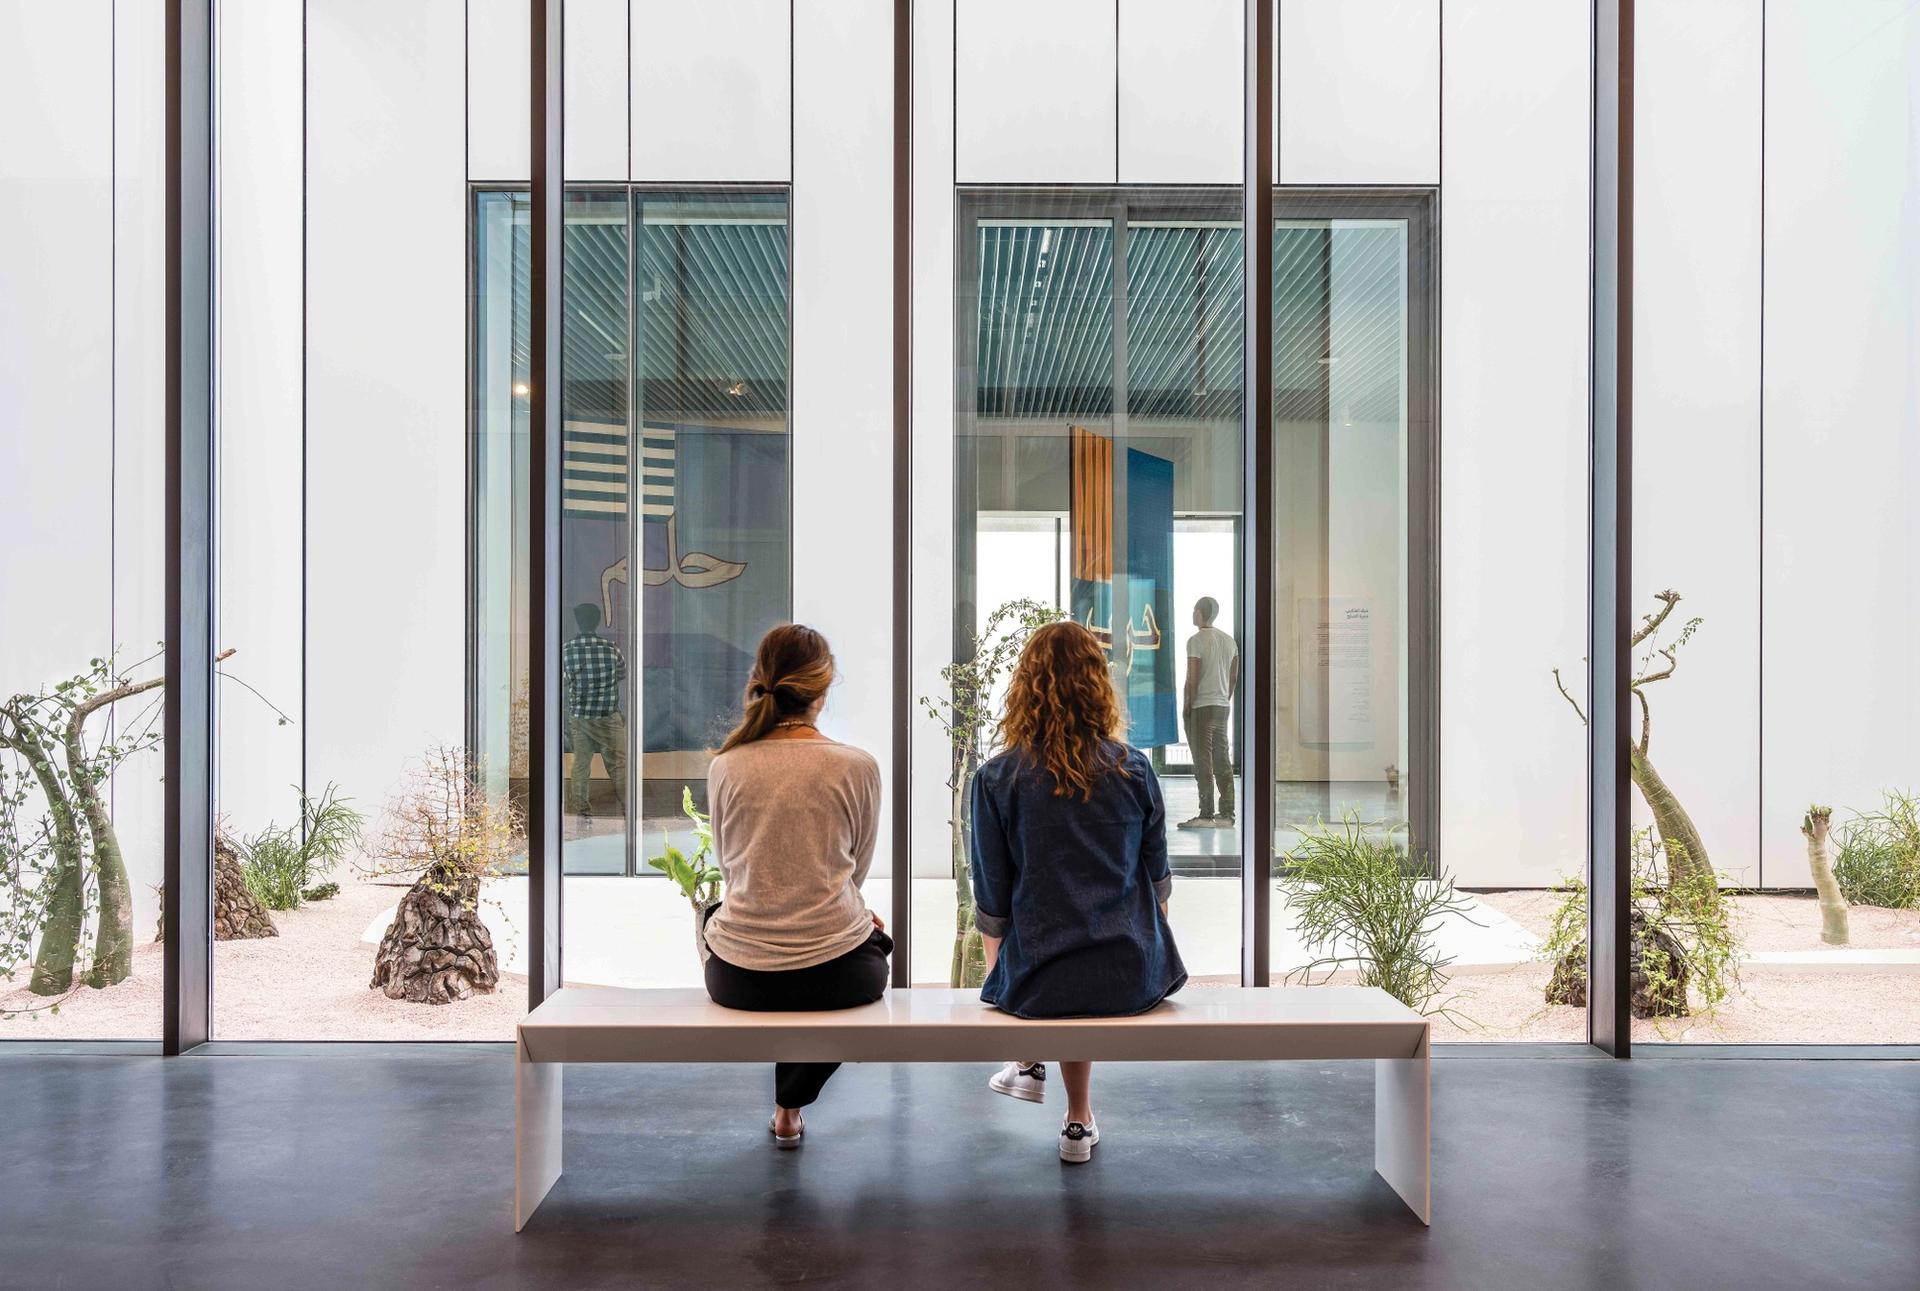 The new Jameel Arts Centre in Dubai © Mohamed Somji